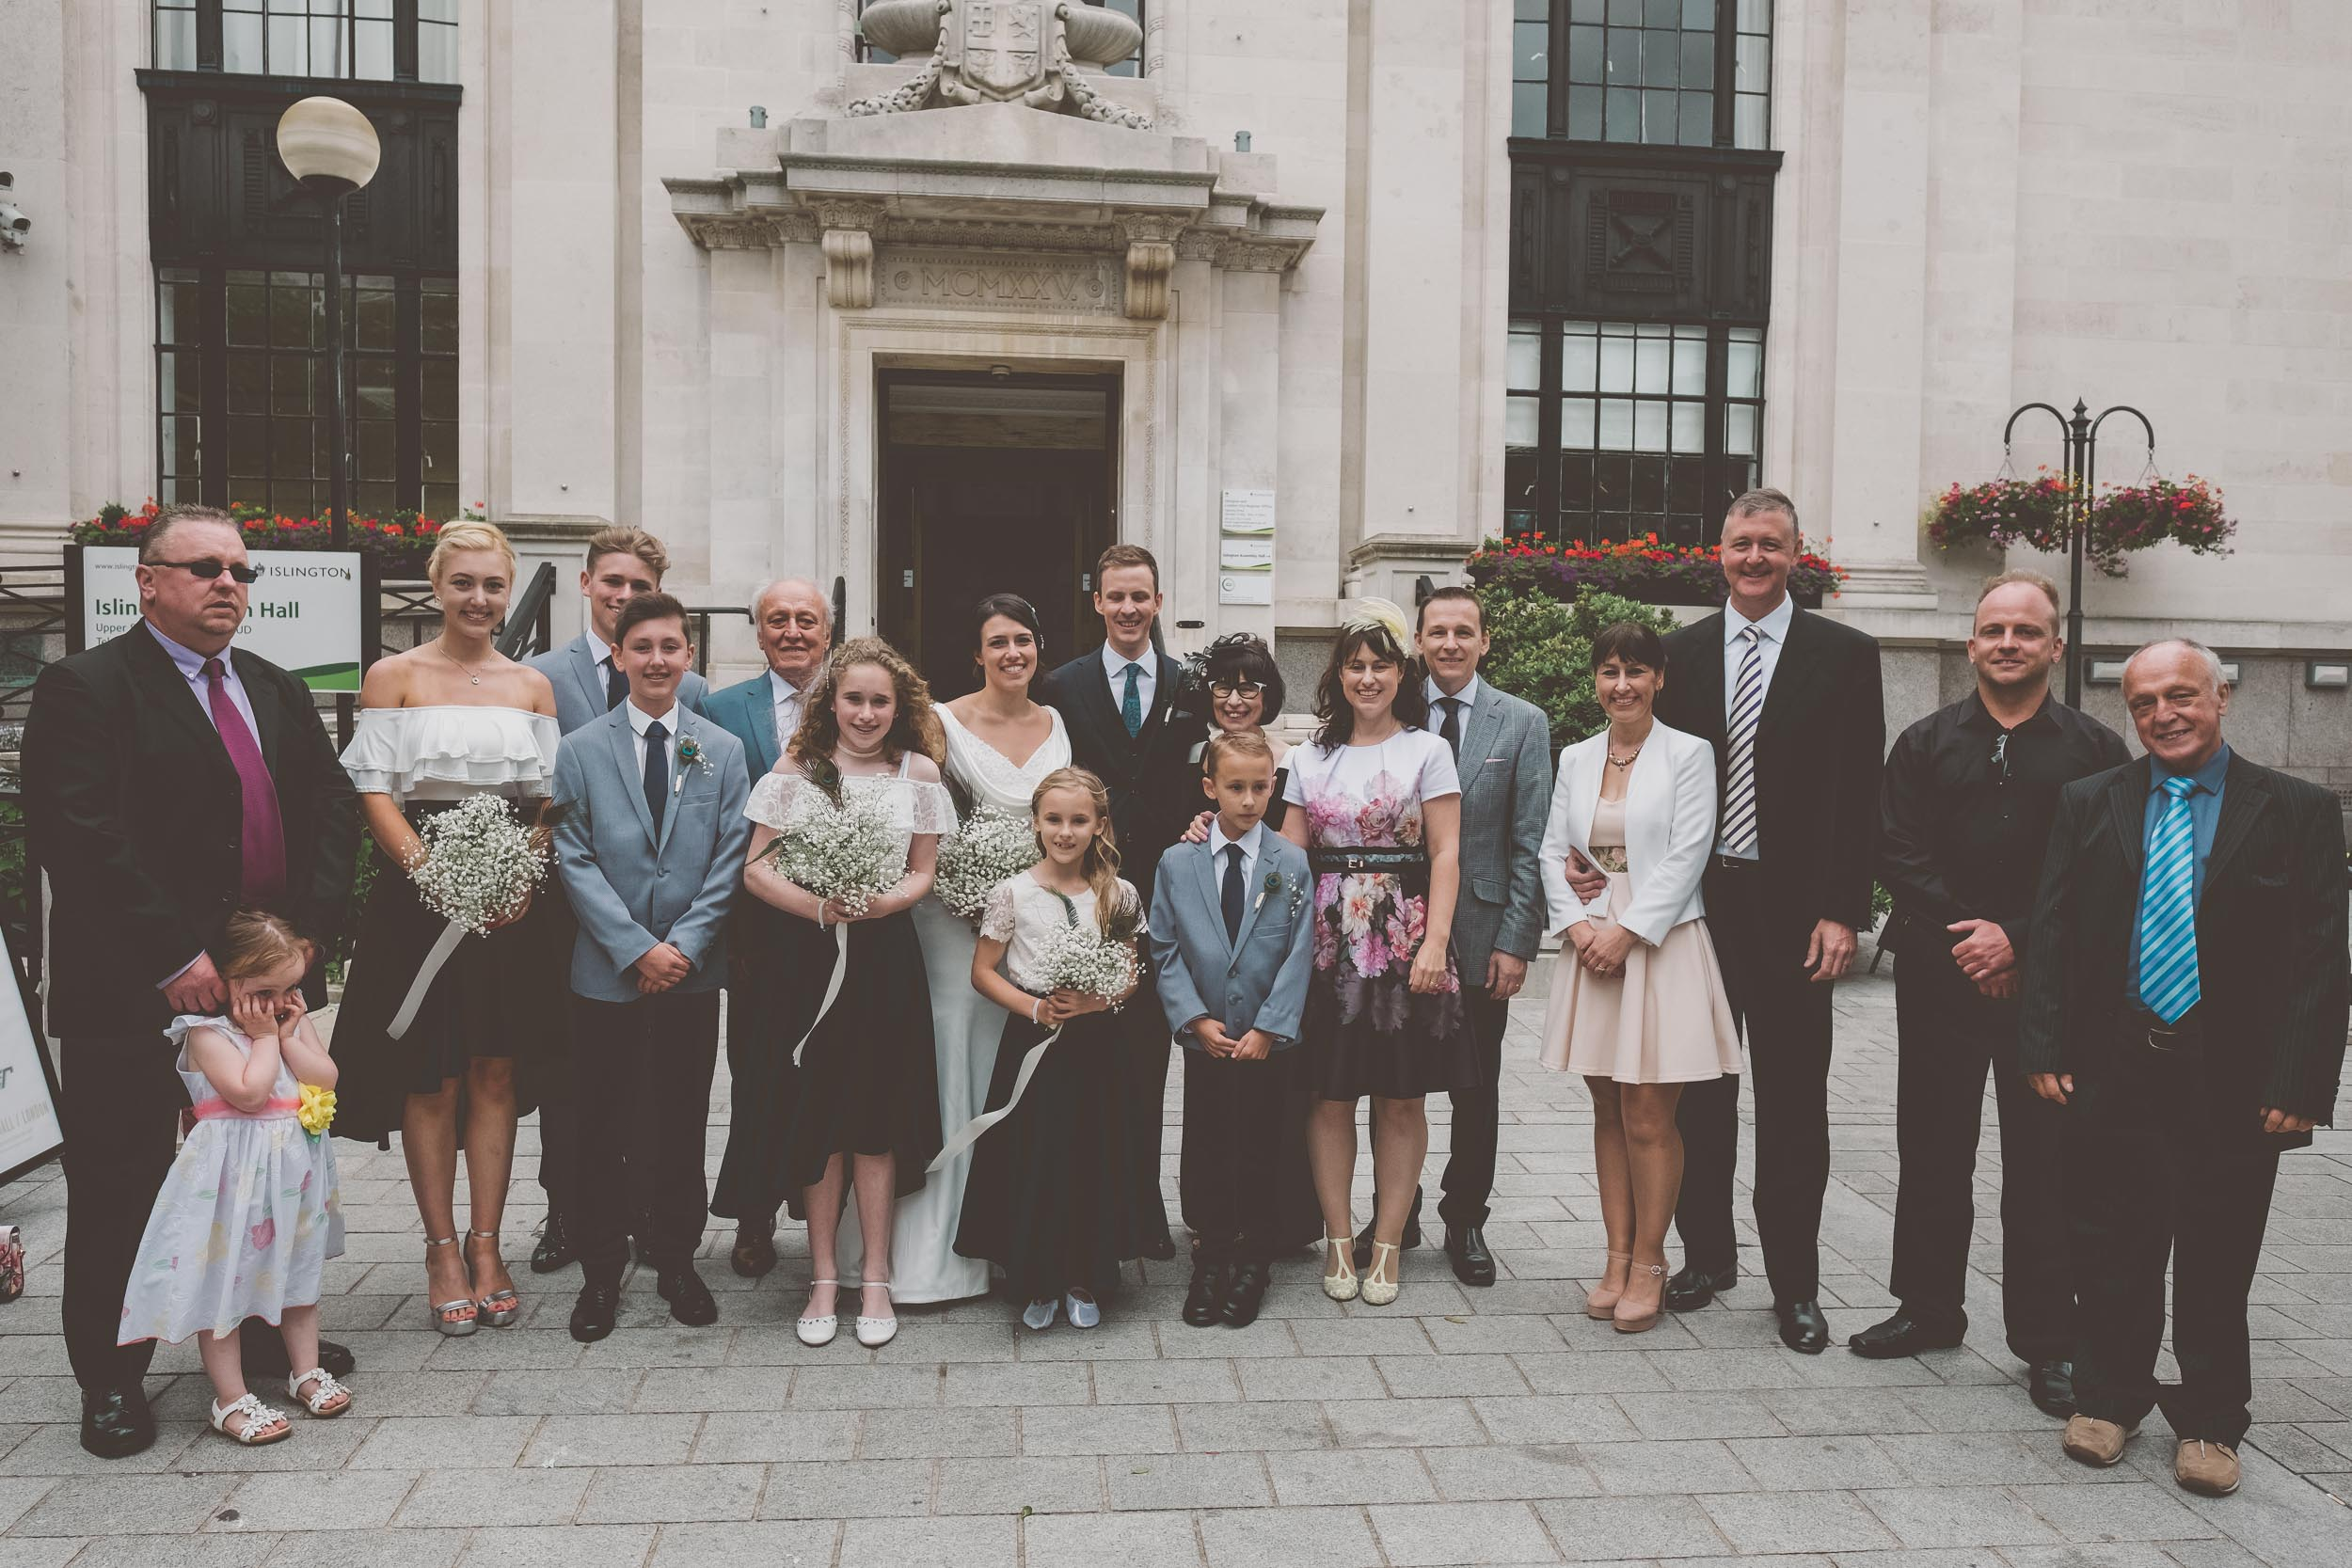 islington-town-hall-4th-floor-studios-wedding179.jpg